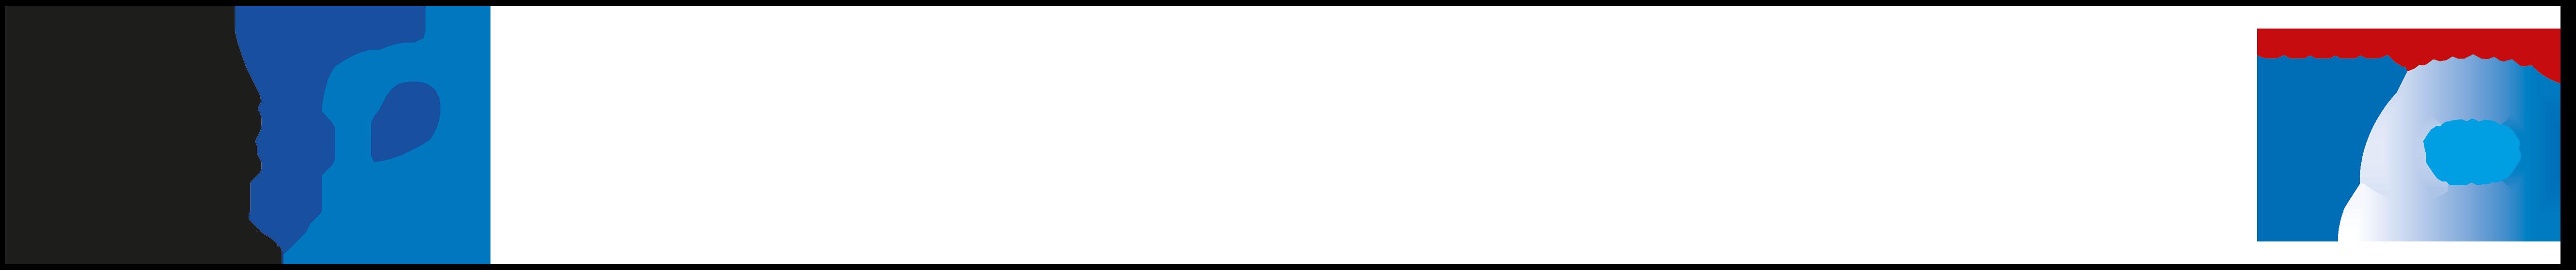 PoddsPrint